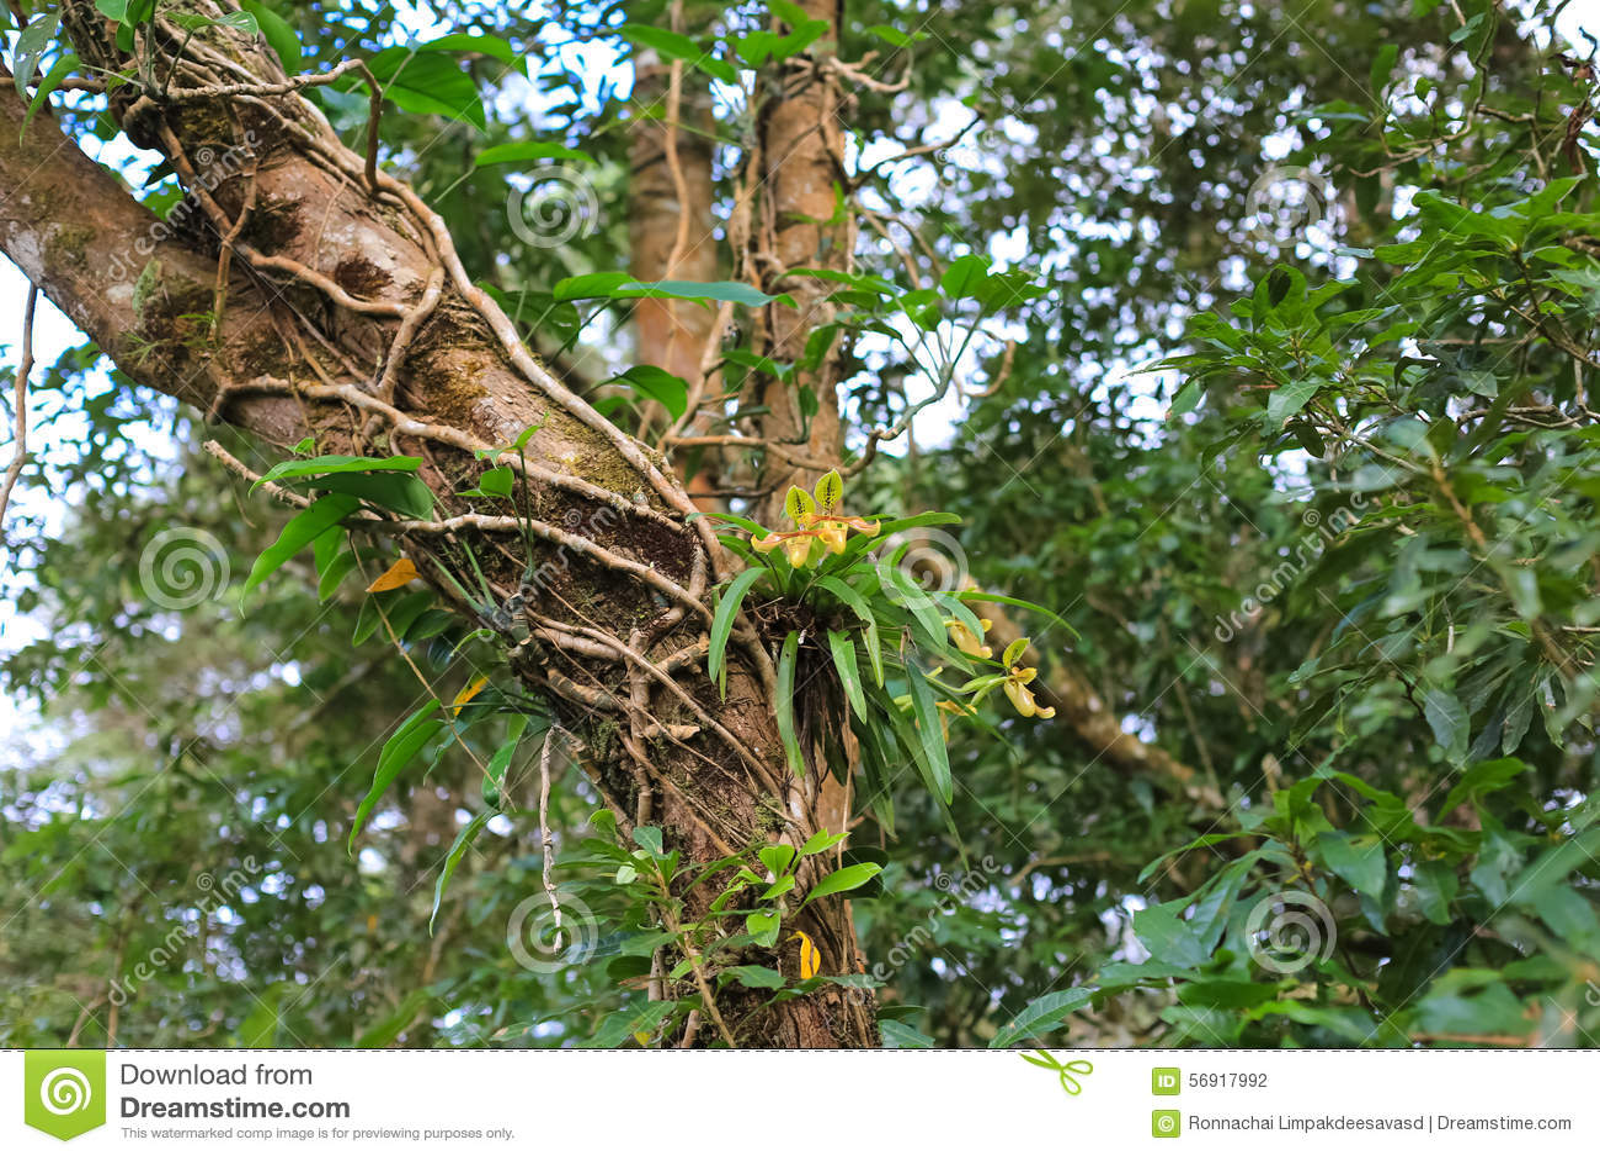 Orchideen im tropischen regenwald  Orchideen Im Regenwald Stockfoto - Bild: 56917992